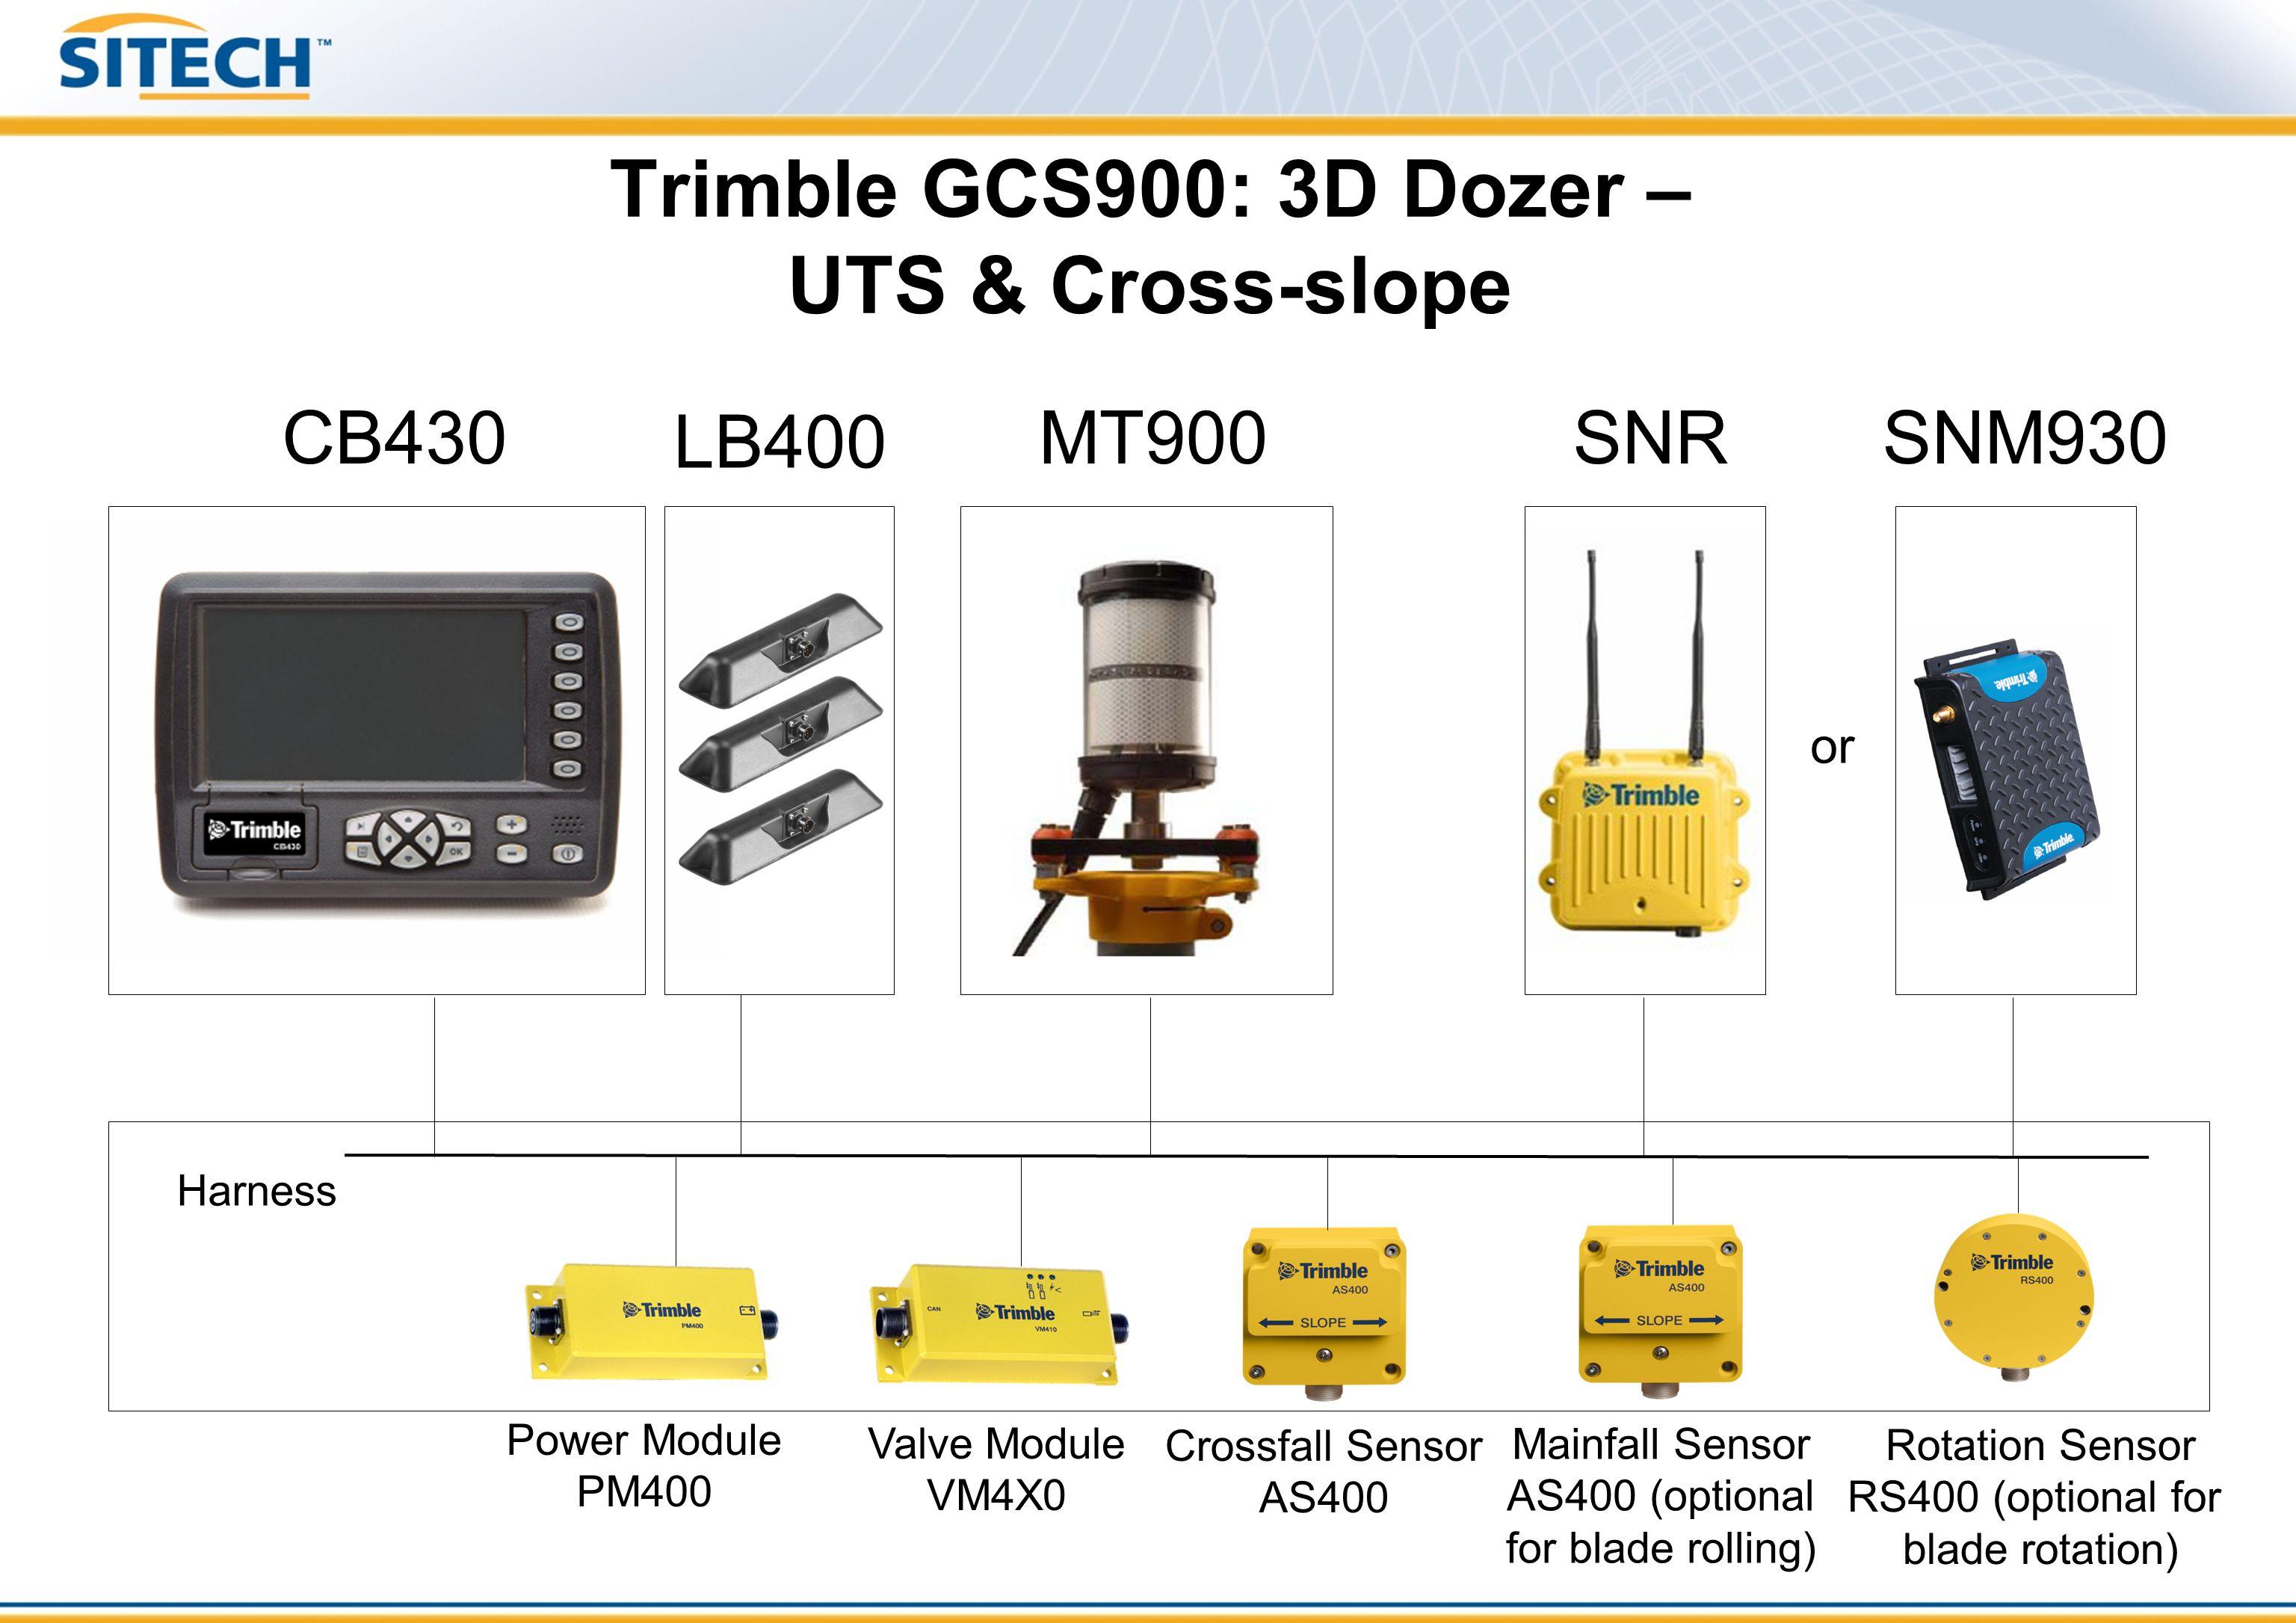 Trimble GCS900: 3D Dozer – GNSS & Cross-slope Harness Power Module PM400 Valve Module VM4X0 Crossfall Sensor AS400 Rotation Sensor RS400 (optional for blade rotation) Mainfall Sensor AS400 (optional for blade rolling) CB430 LB400 SNRMS9X0SNM930 or